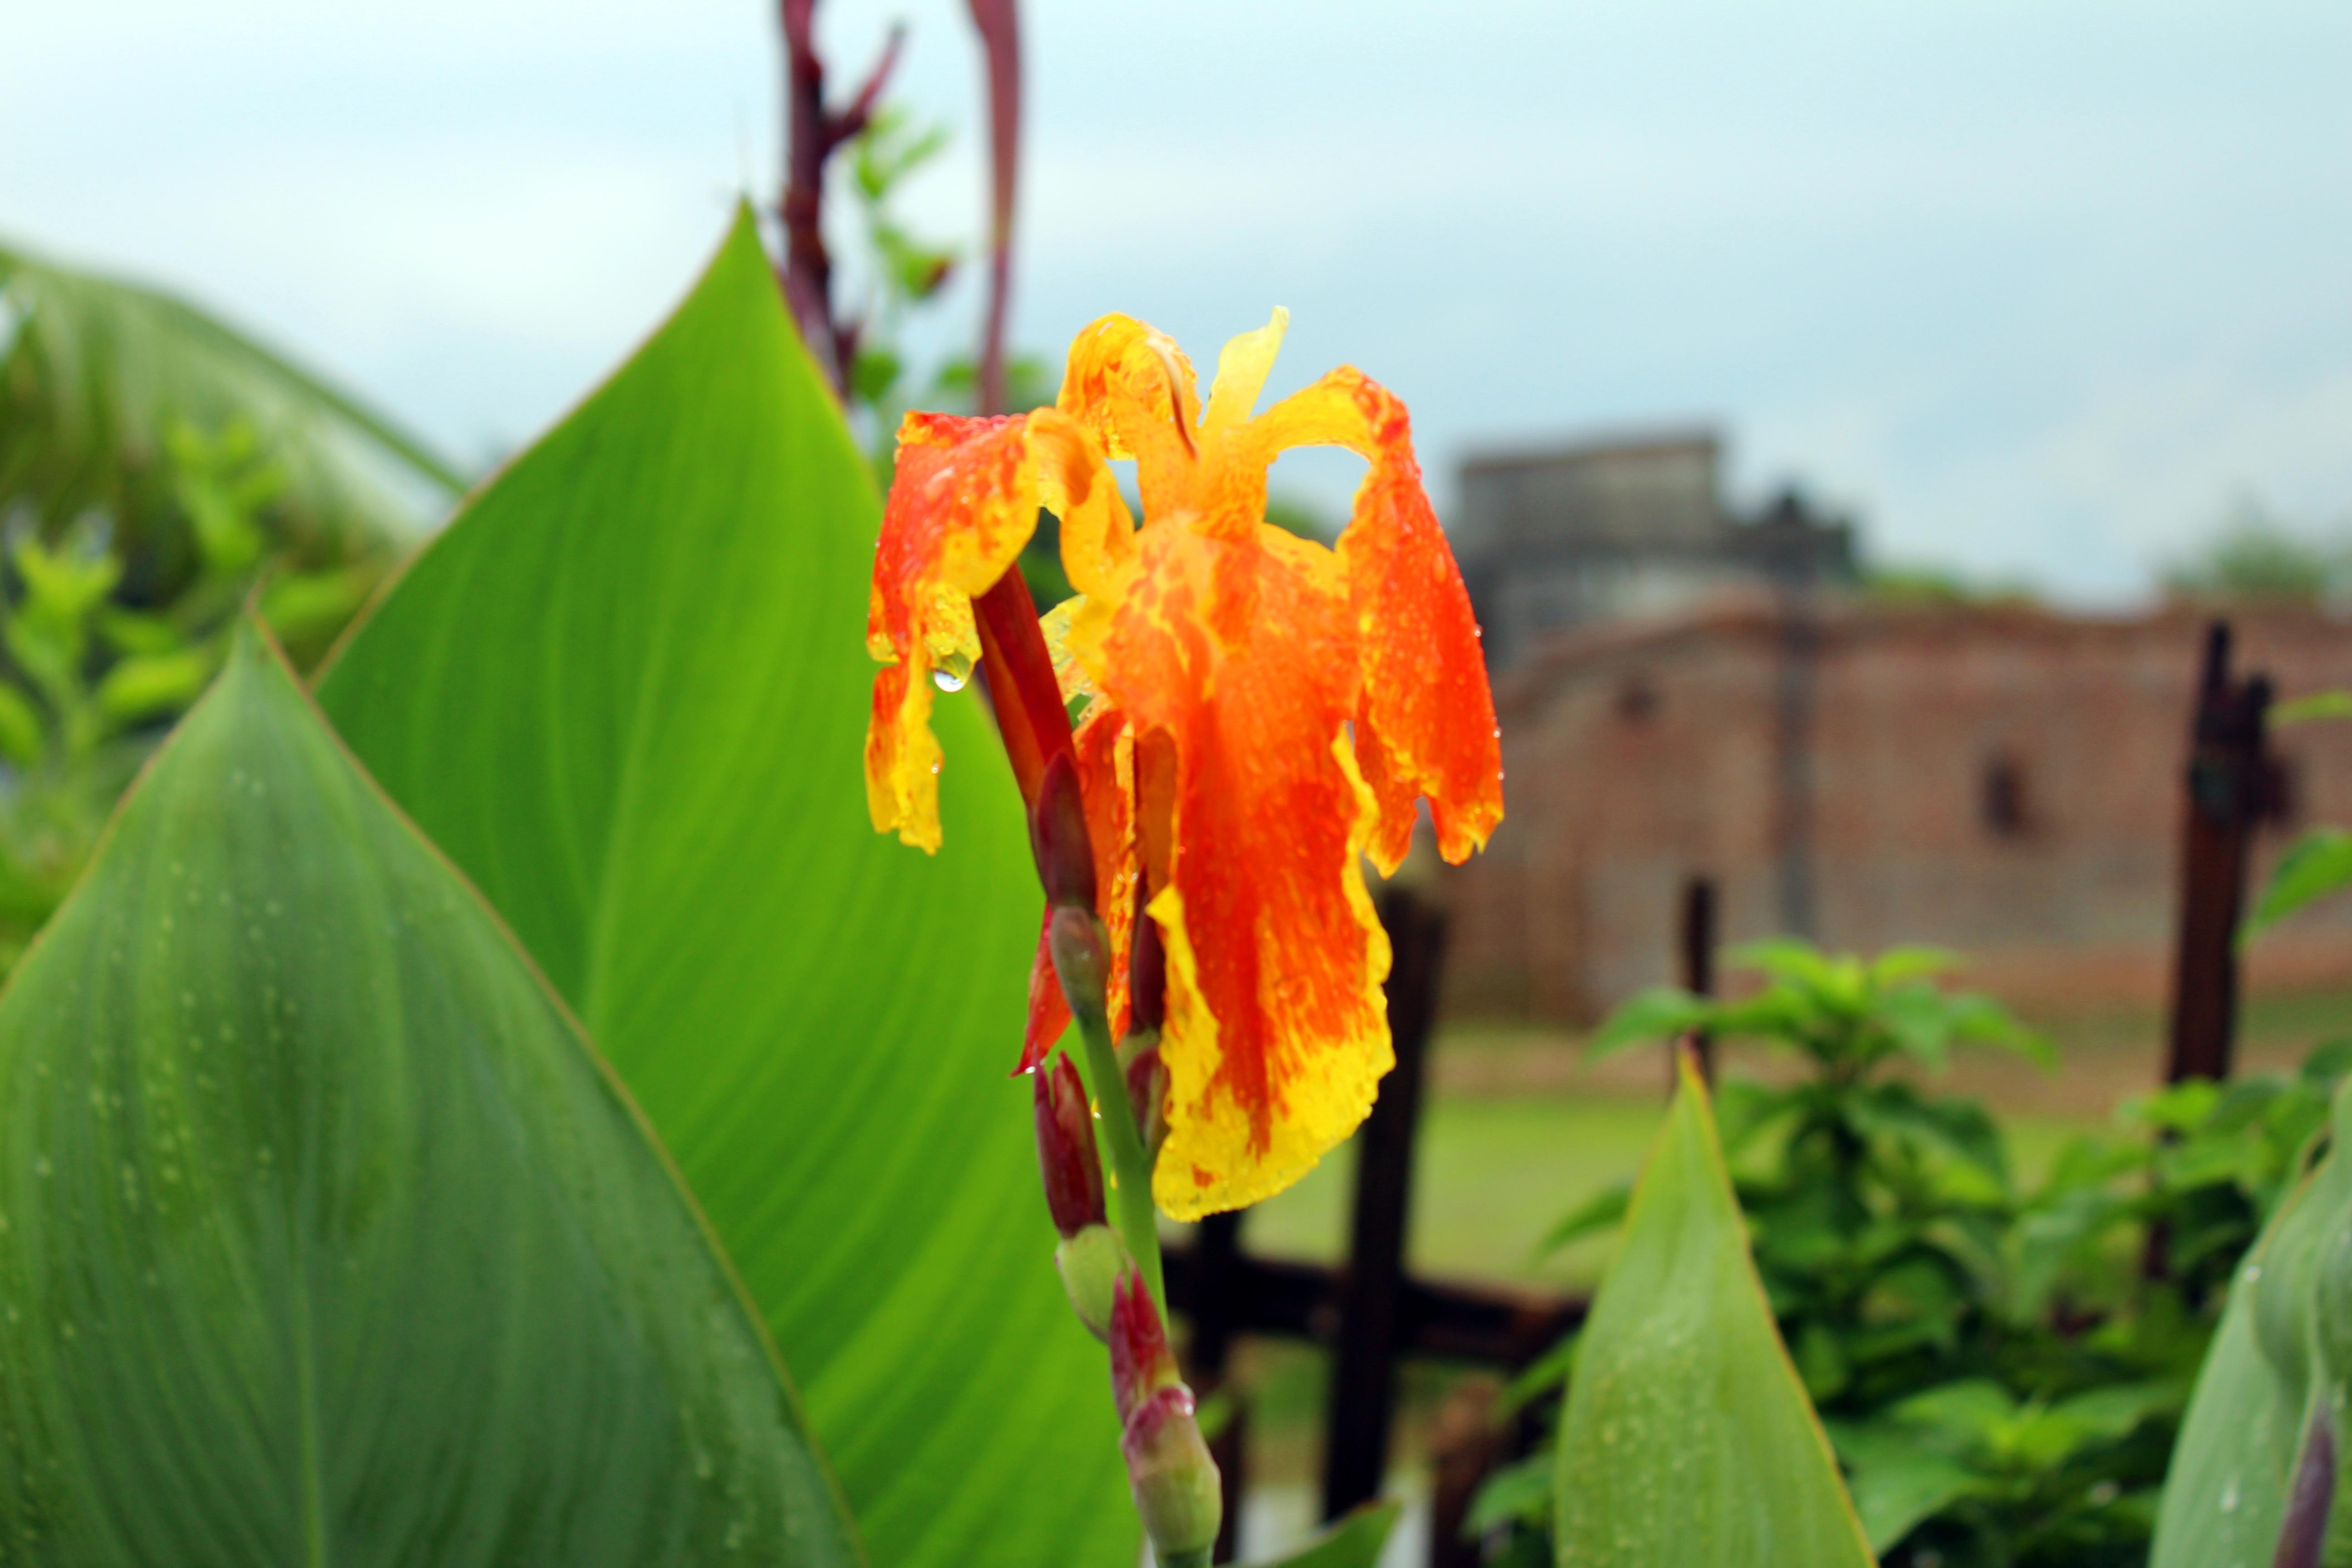 Filecanna Flower Yellow And Orange 01g Wikimedia Commons